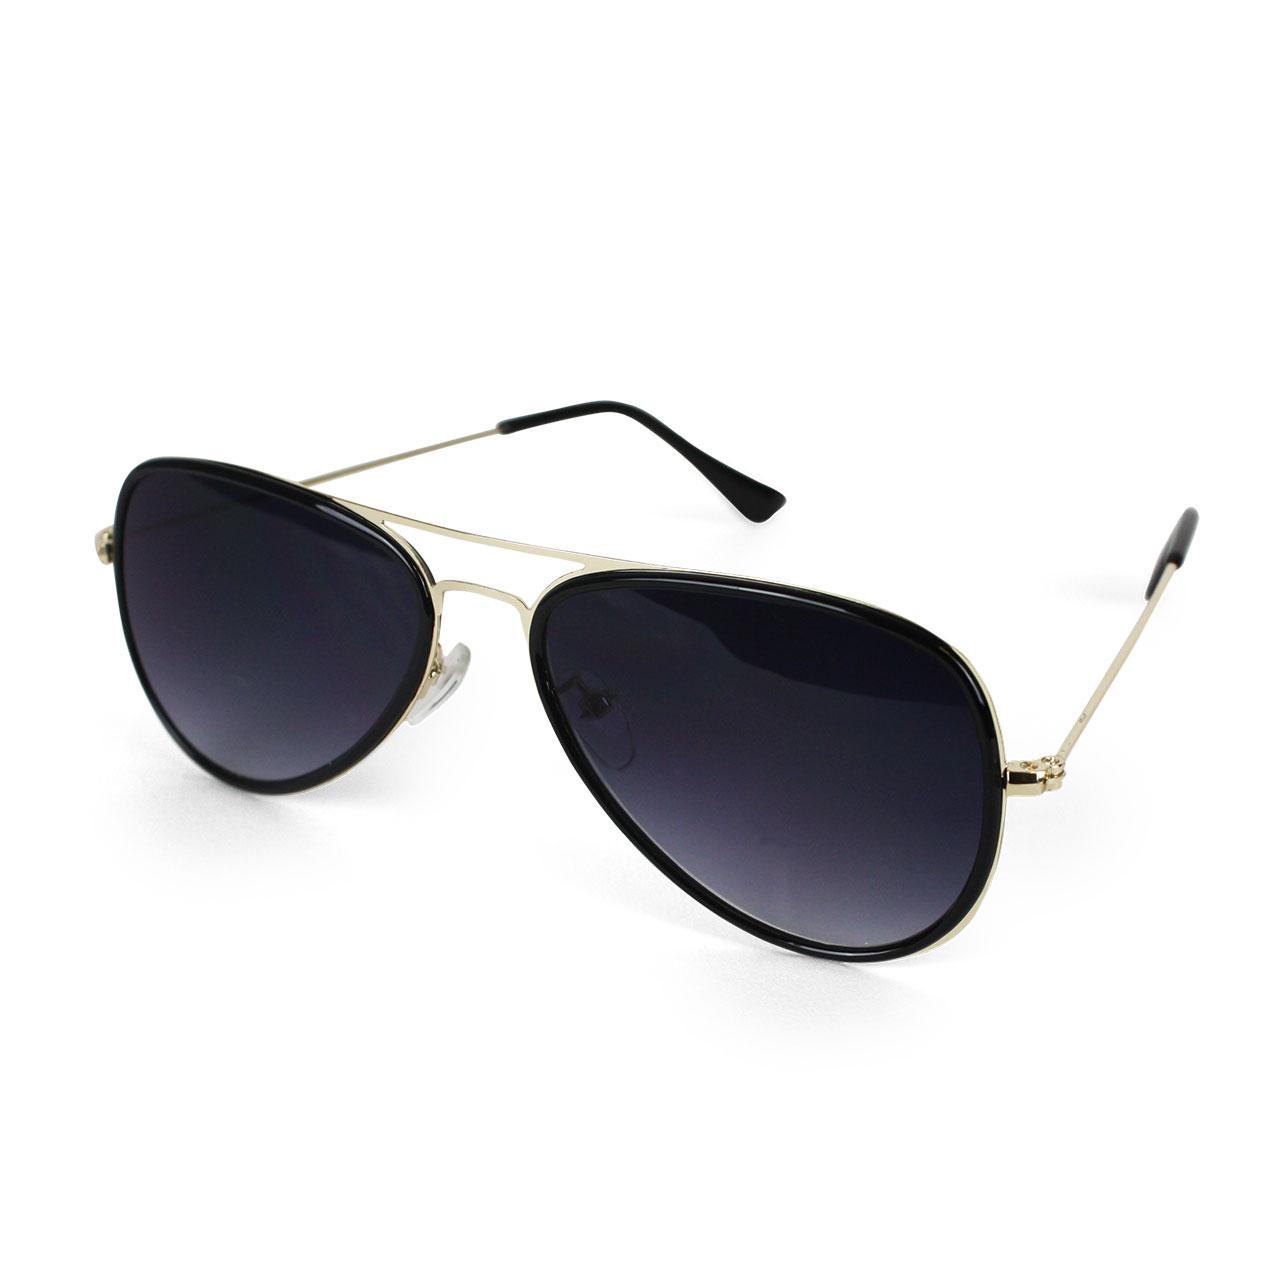 Unisex Polarized Night Black Sky Aviator Sunglasses